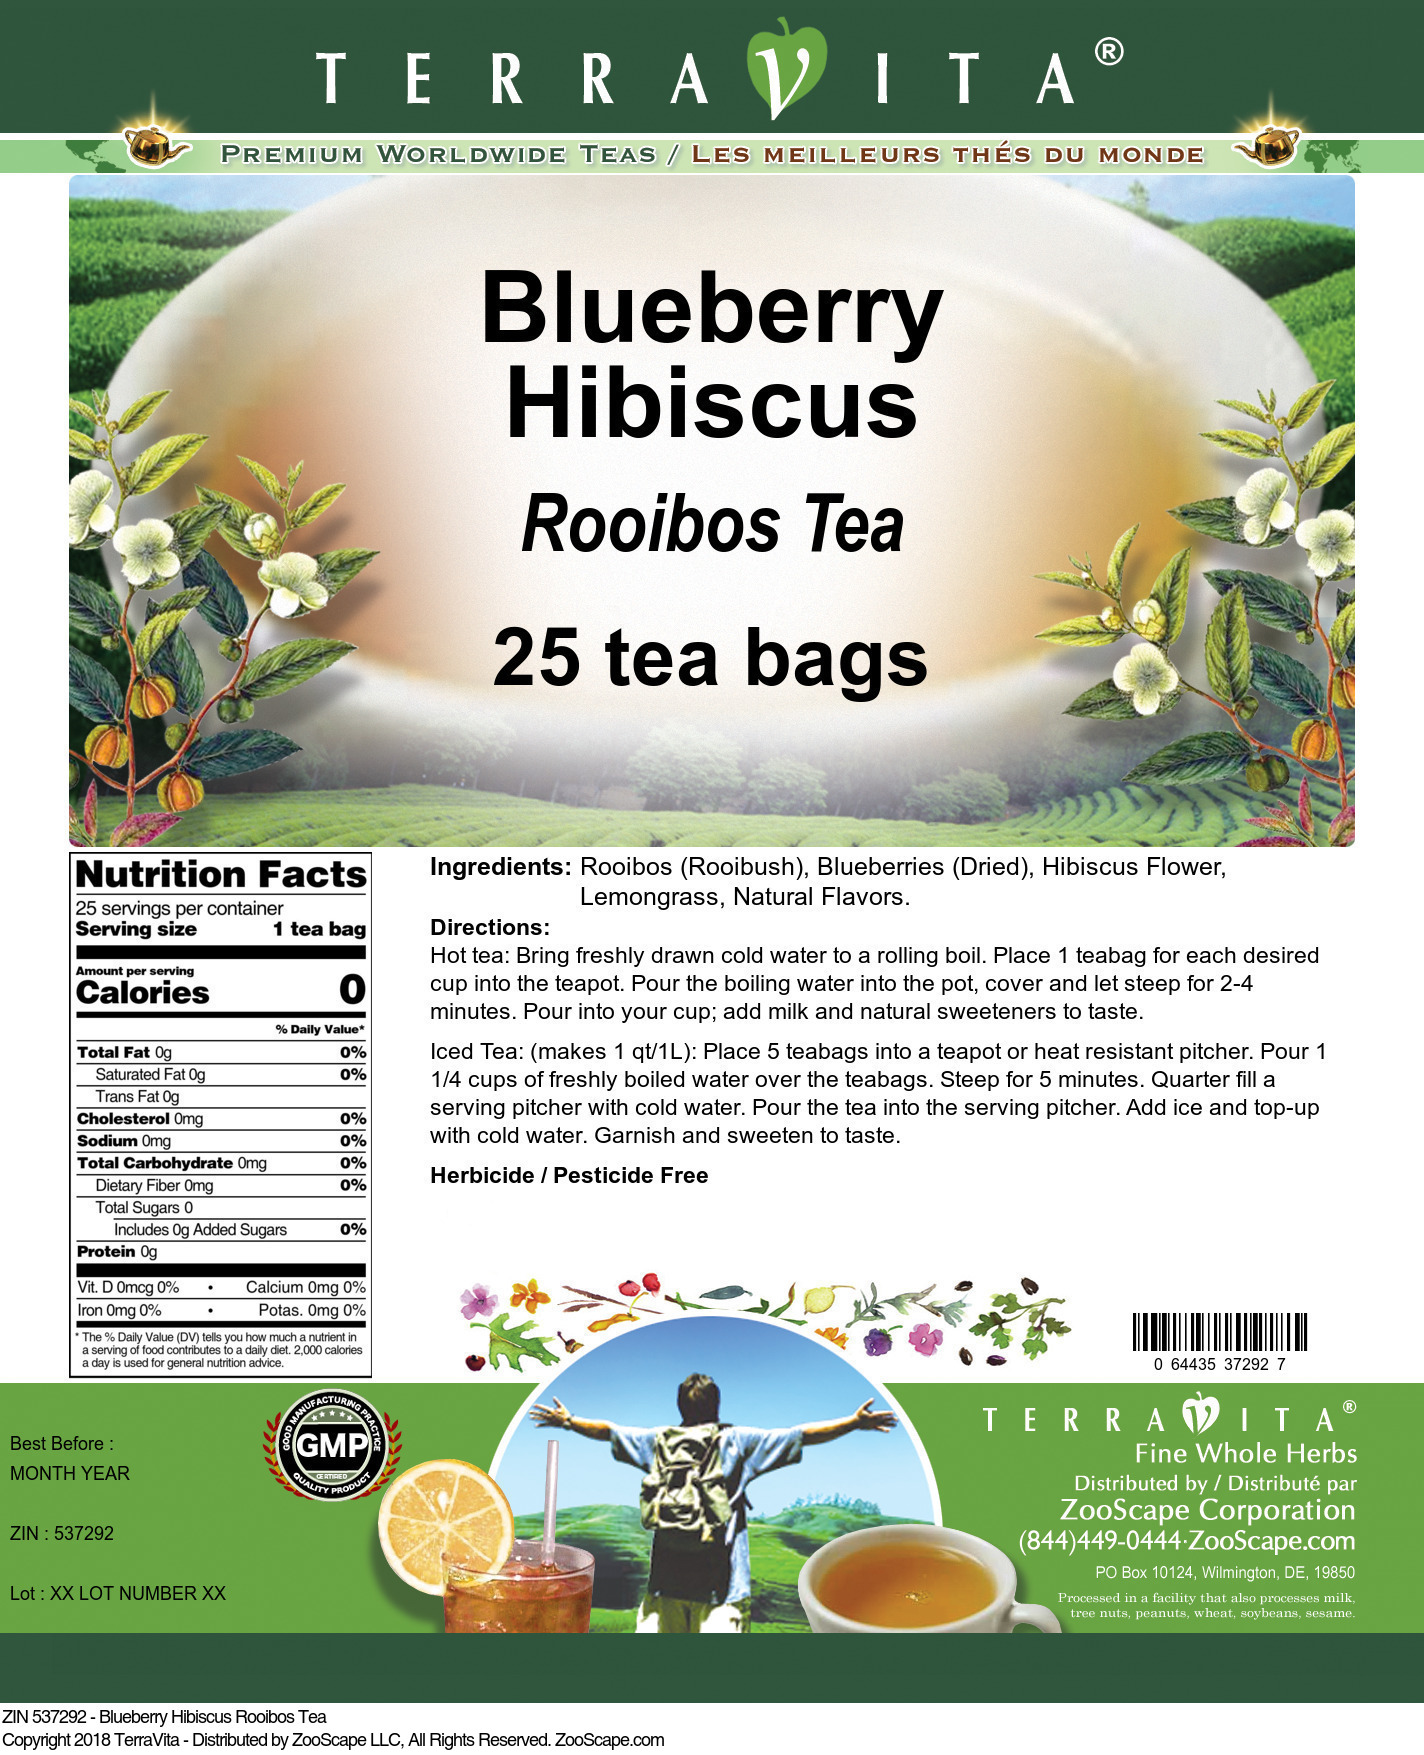 Blueberry Hibiscus Rooibos Tea